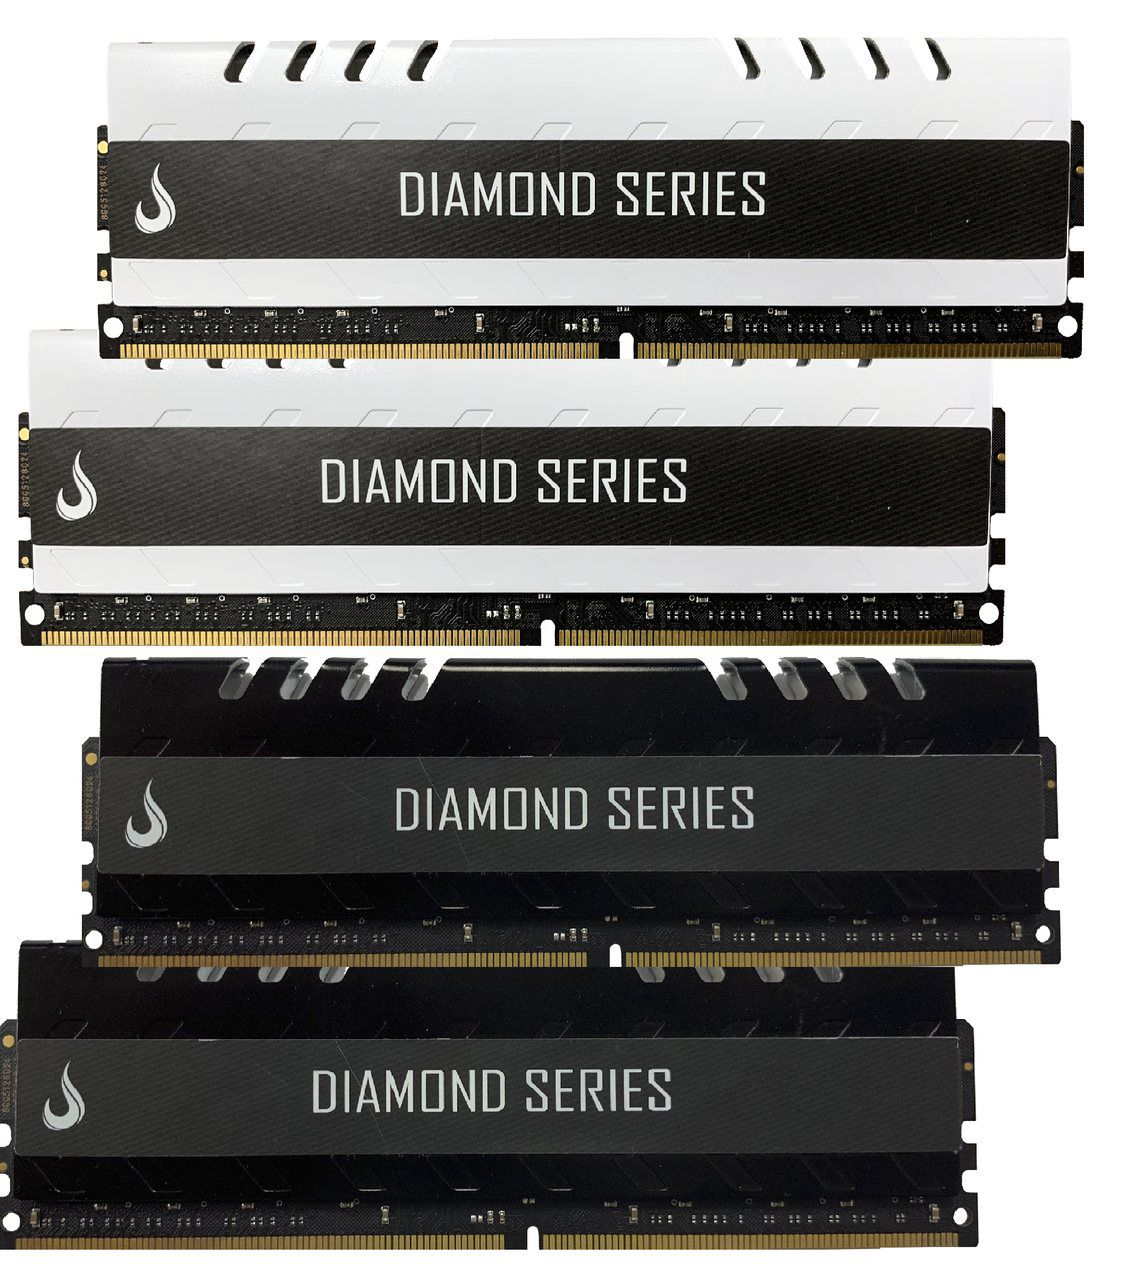 Combo 4x Memoria Ram DDR4 4GB 3000MHZ Diamond - Preta /  Branca